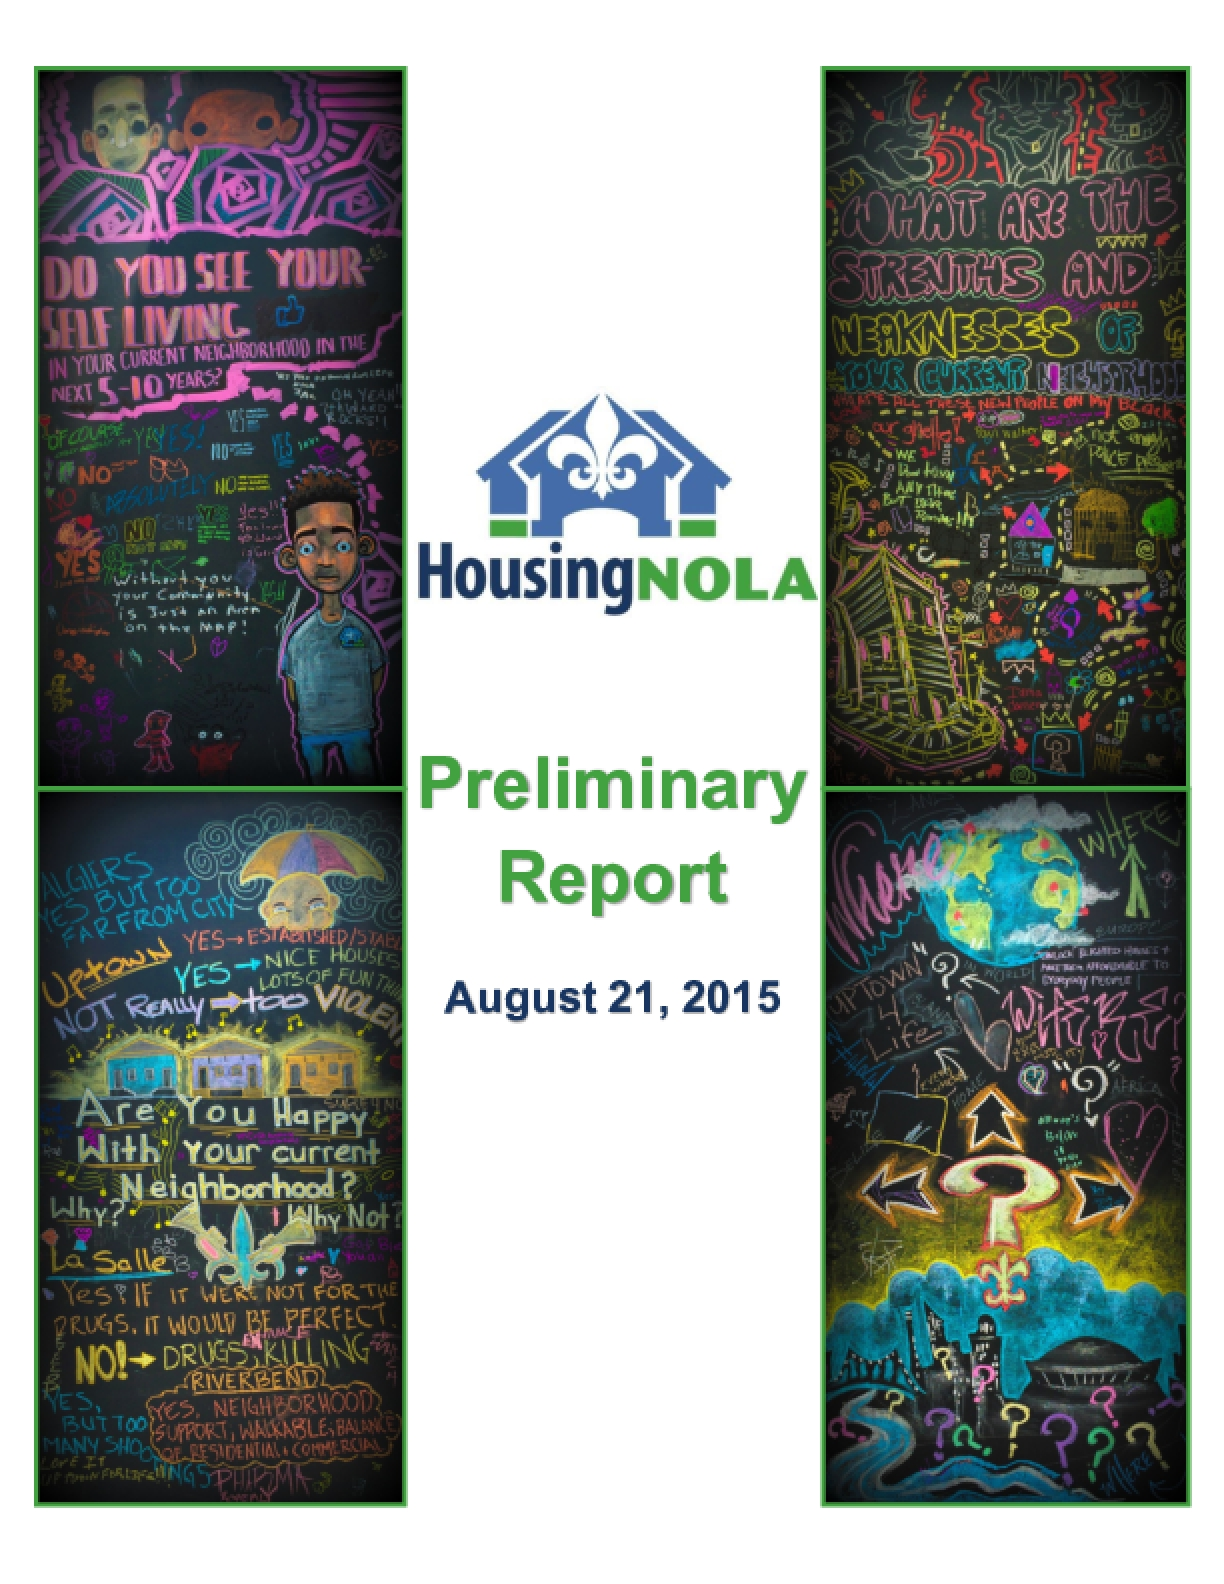 HousingNOLA Preliminary Report